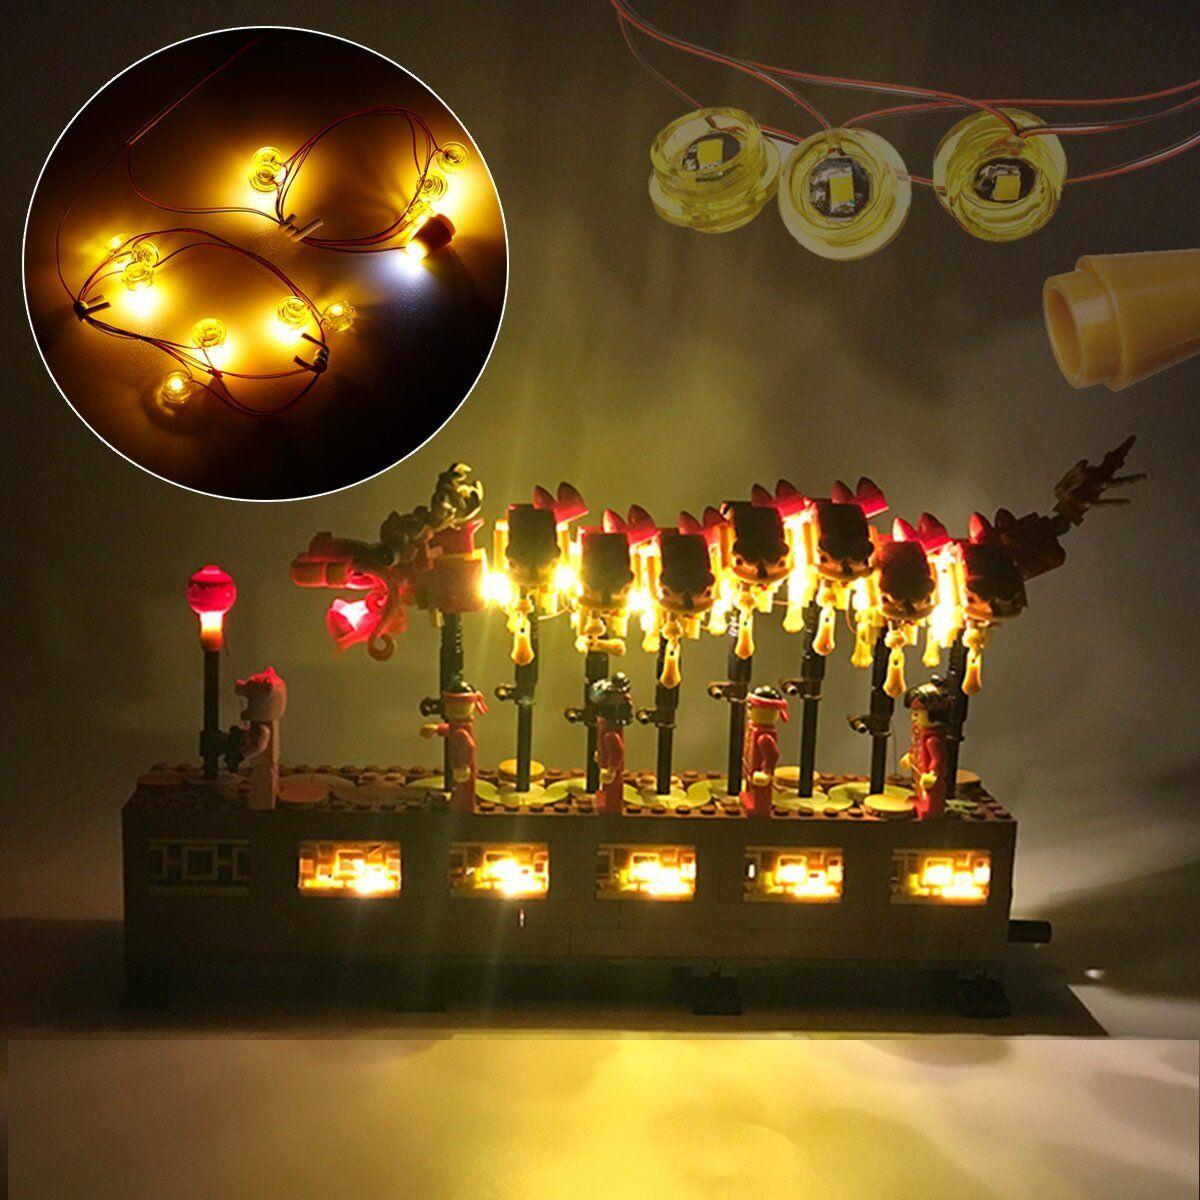 KNR US$25.87 DIY LED Light Lighting Kit For LEGO 80102 Chinese New Year Dragon Dance Bricks Toys